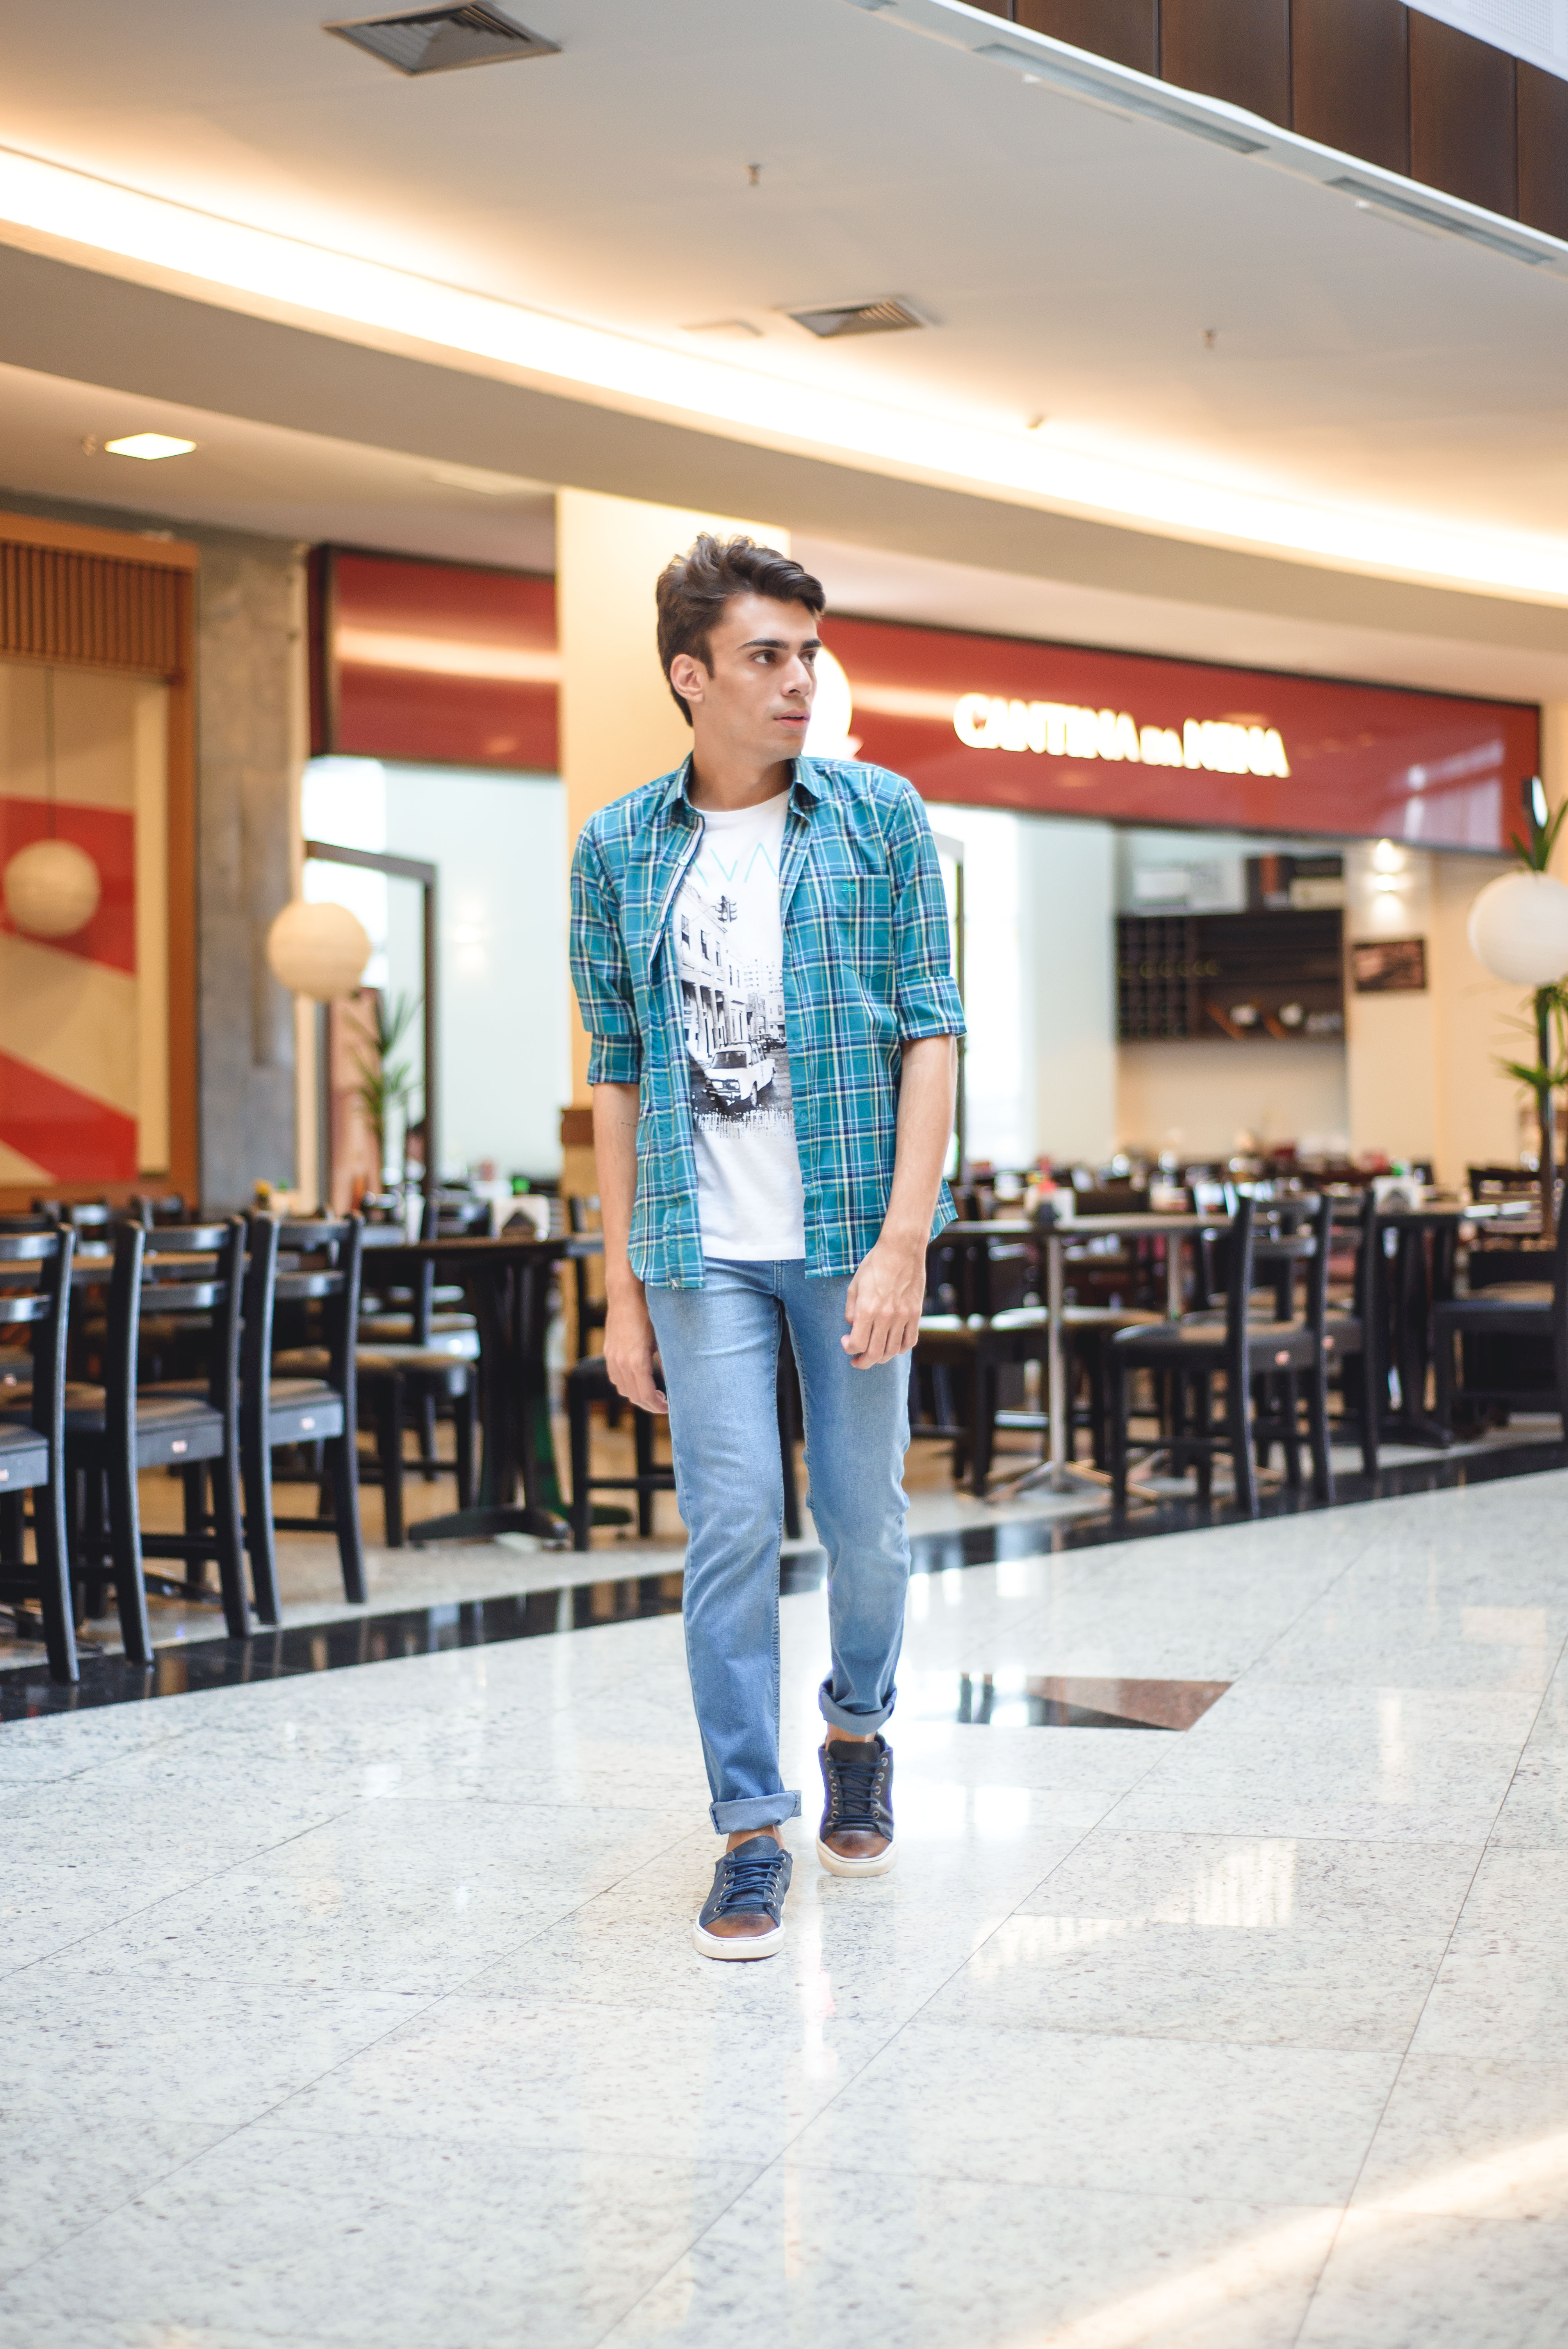 alex cursino, clooset, camila coelho, f hits, patricia abravanel, menswear, blog de moda, blogger, fashion blogger, mens, dicas de moda, roupa masculina, (11)